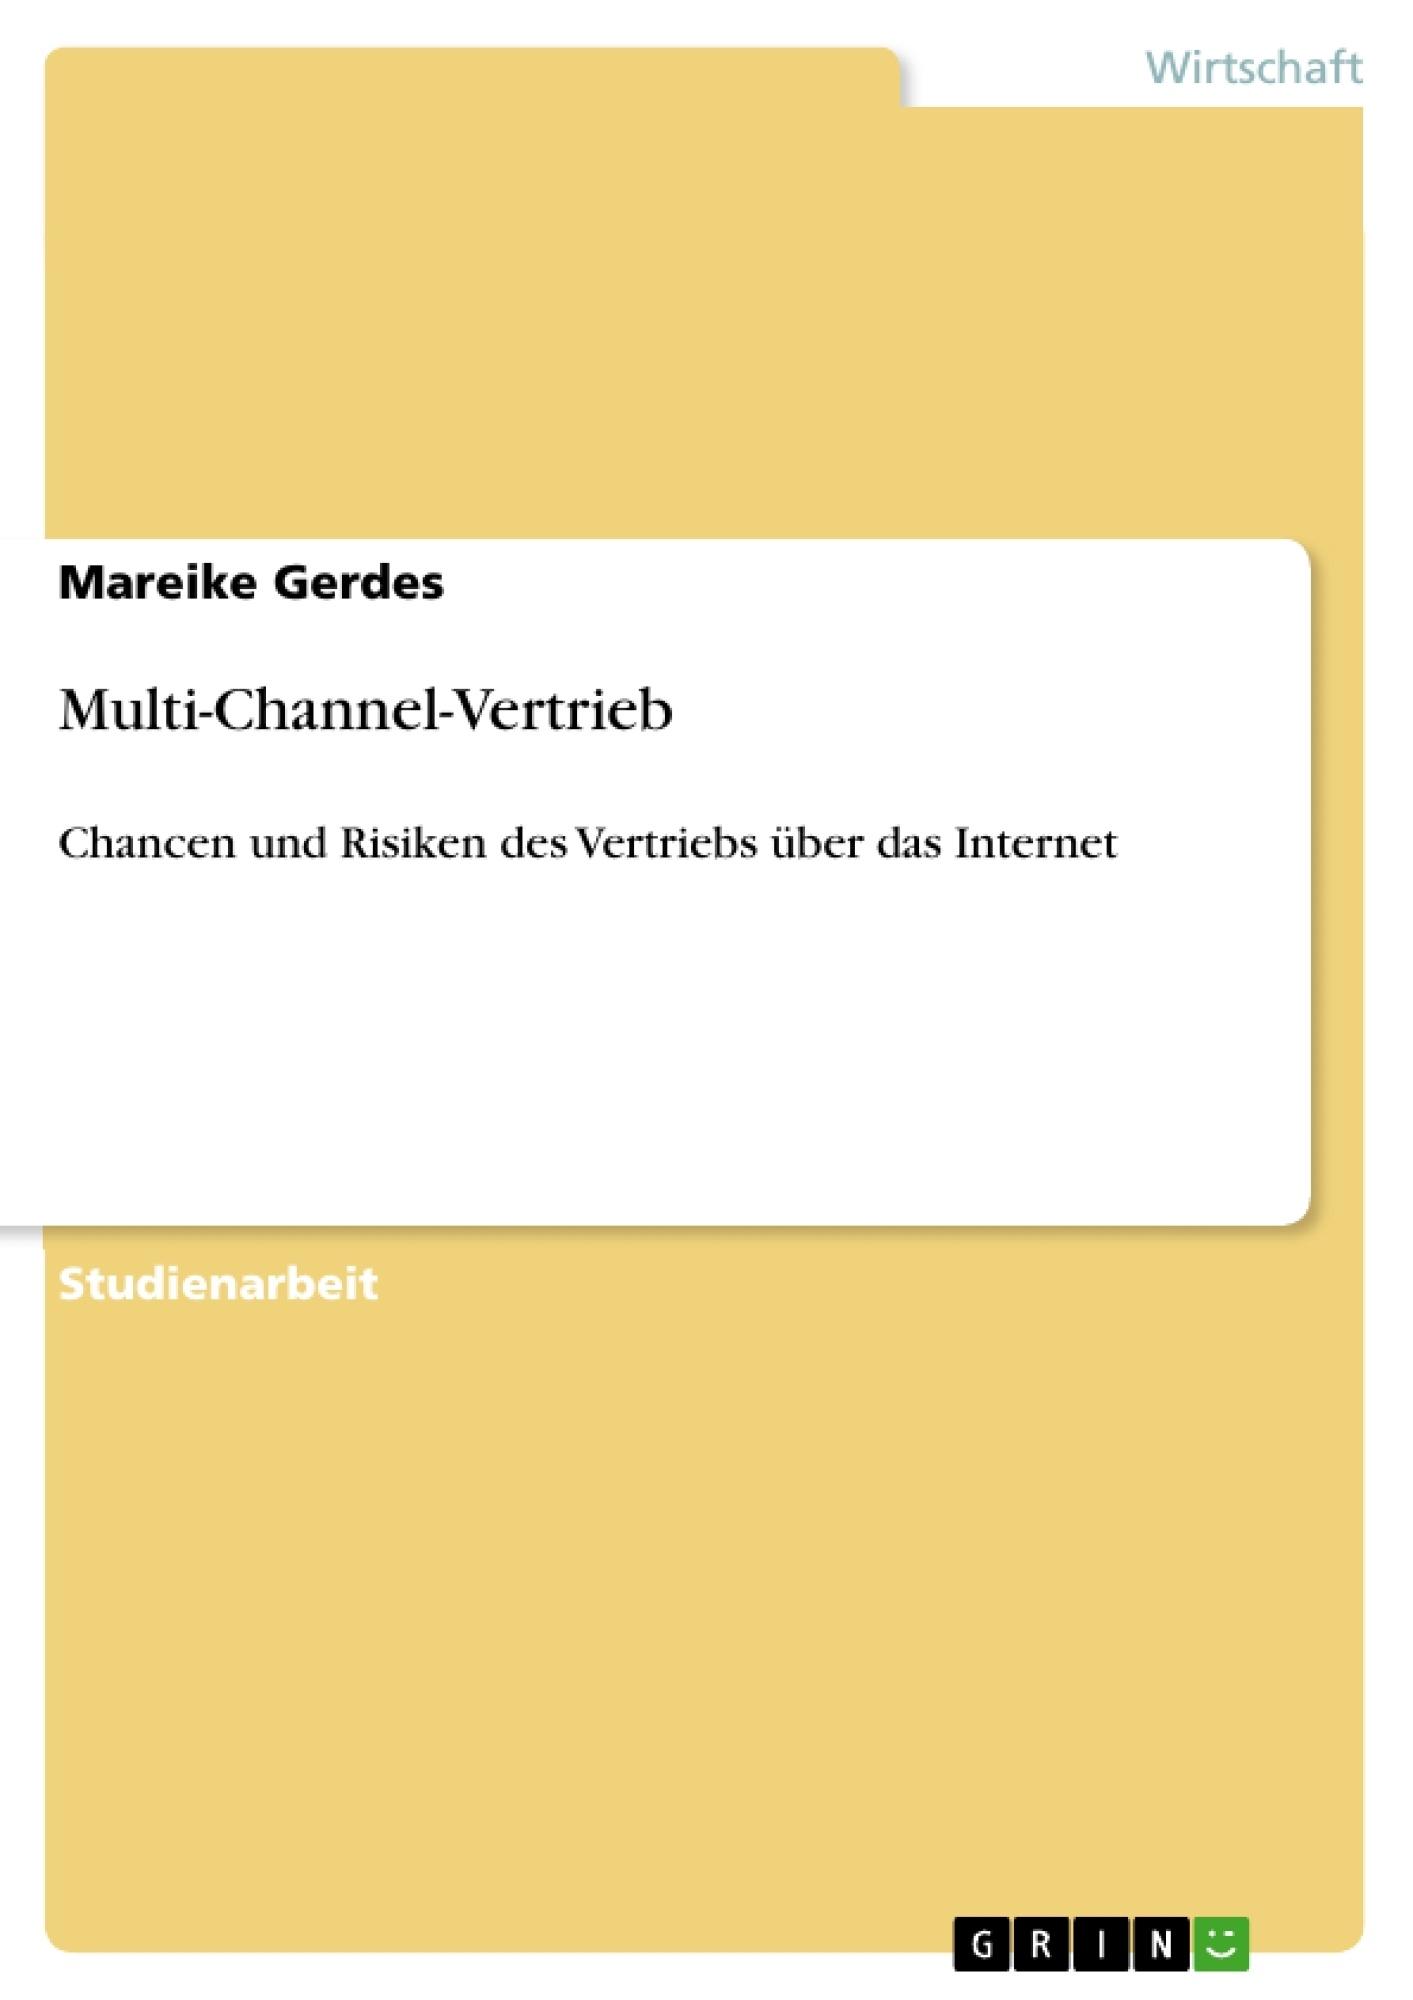 Titel: Multi-Channel-Vertrieb